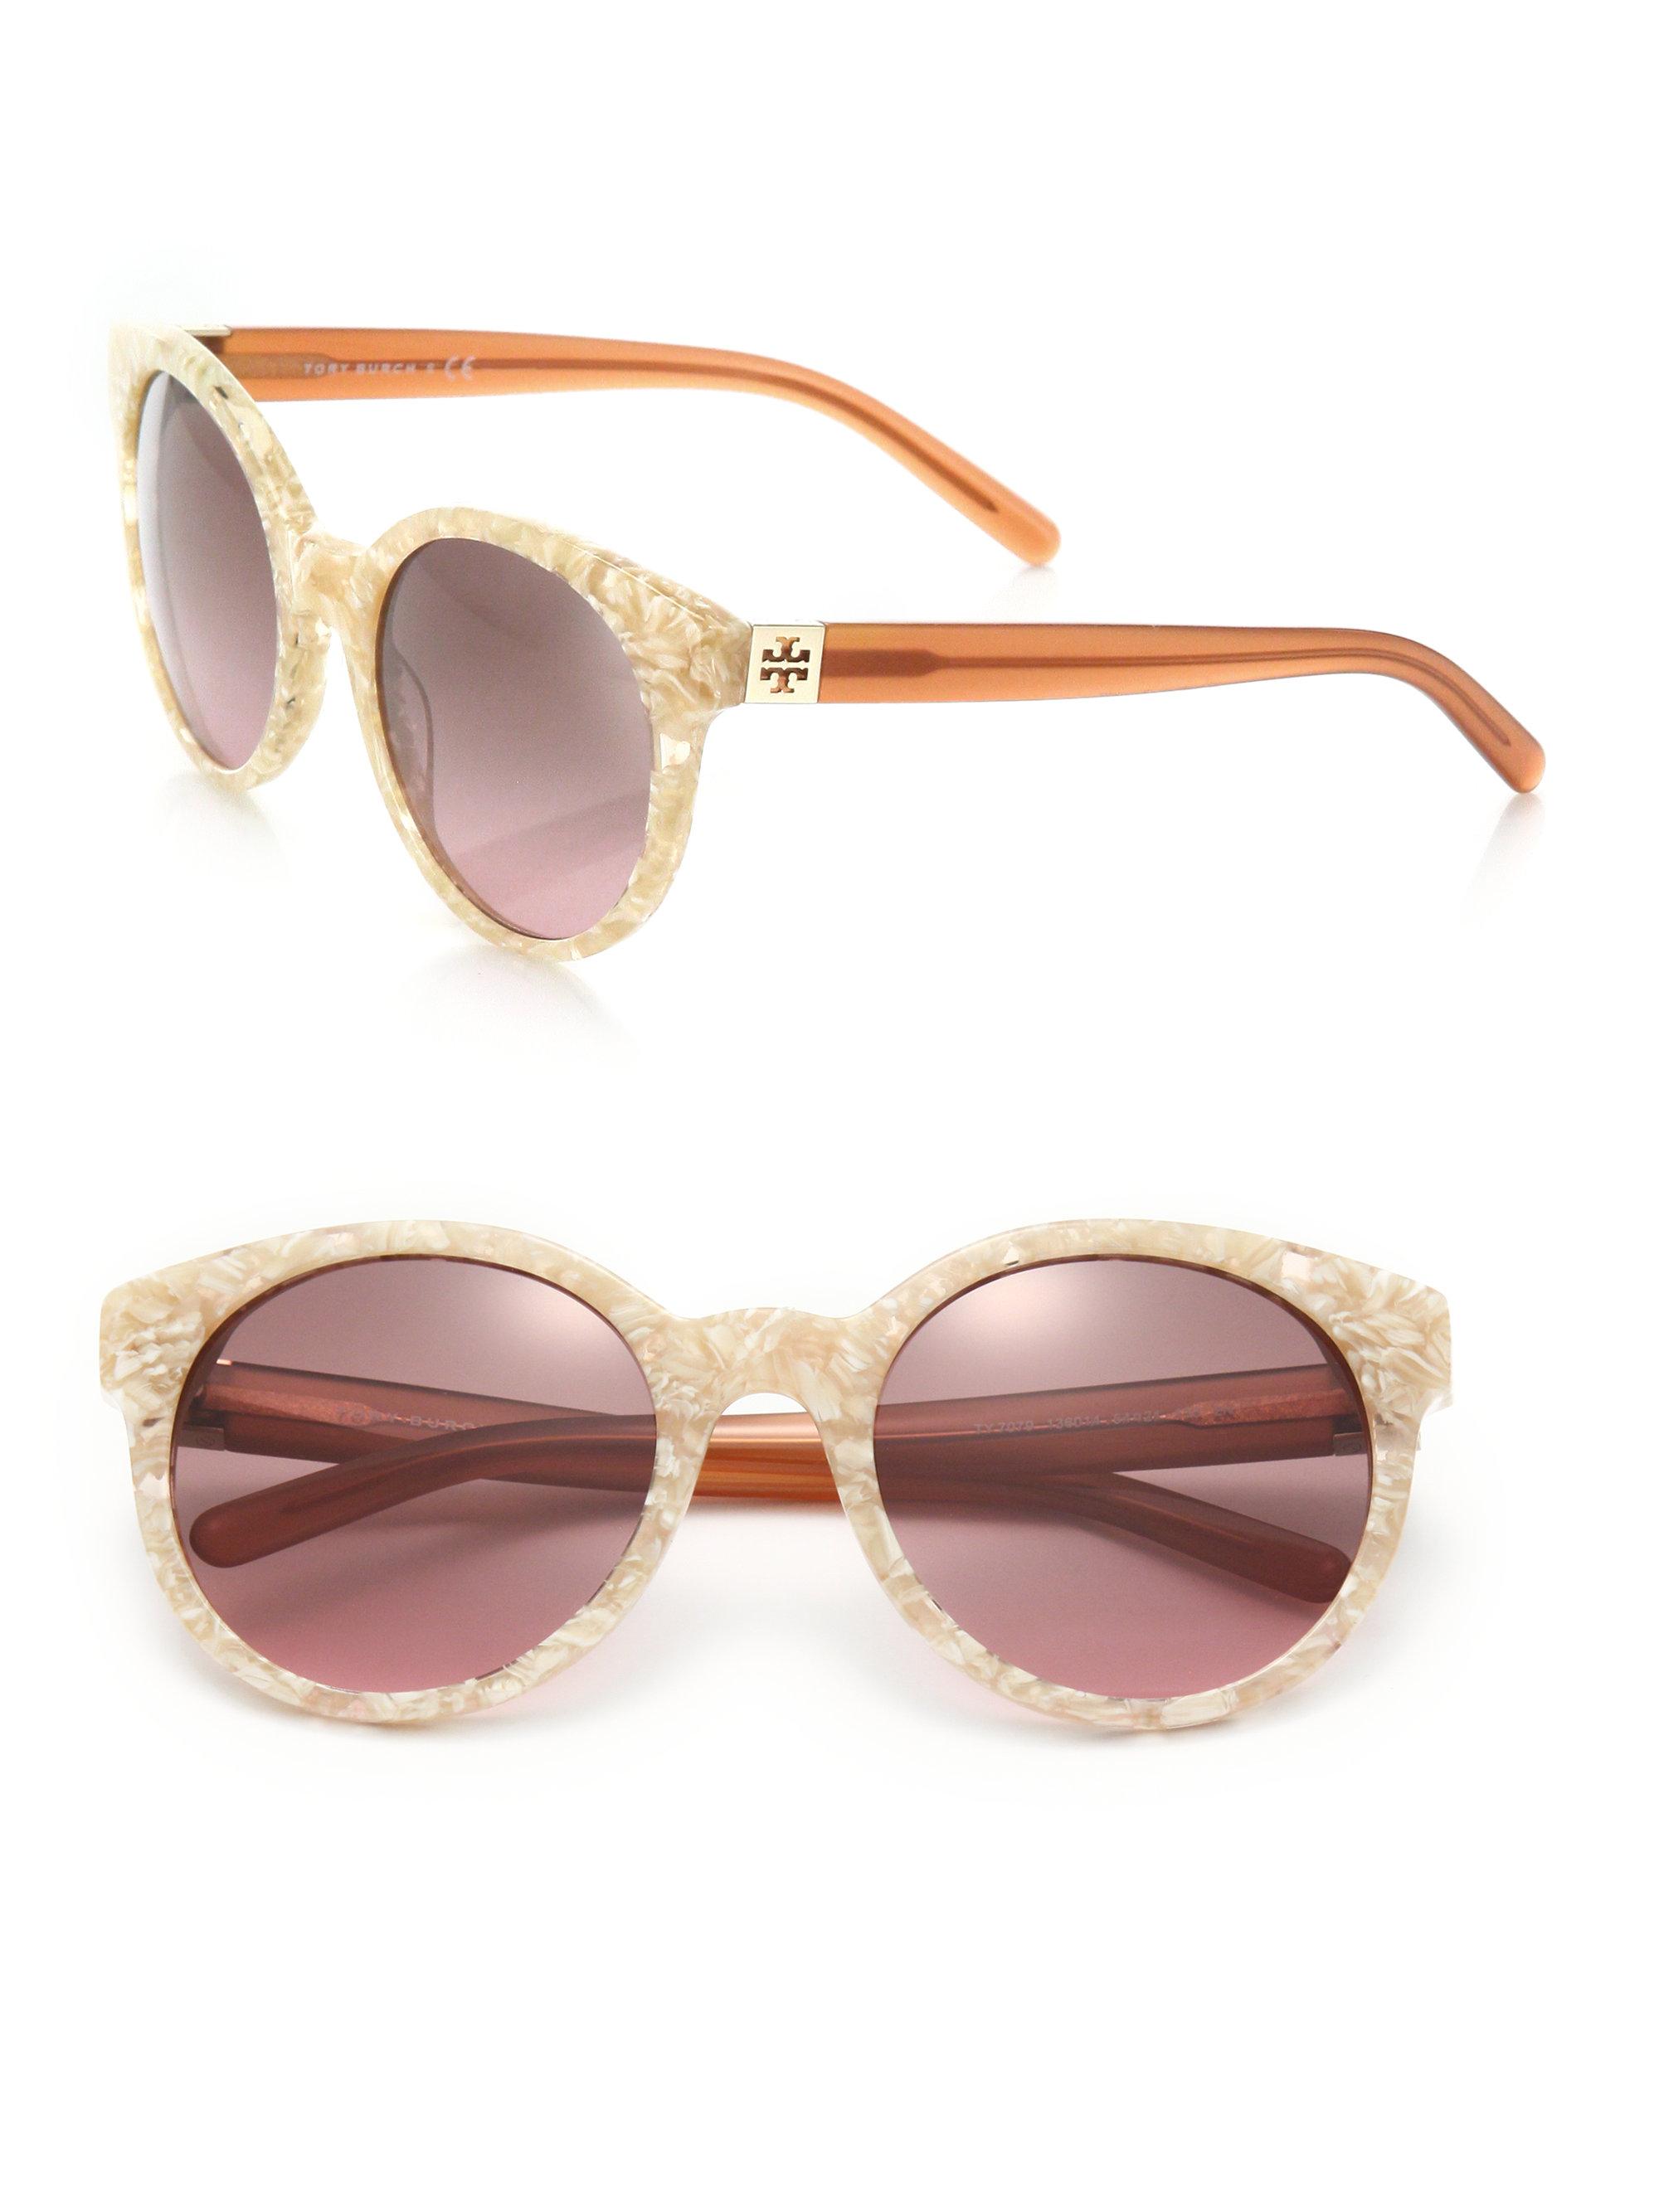 aea2c541af64 Lyst - Tory Burch Vintage 54mm Round Sunglasses in Orange